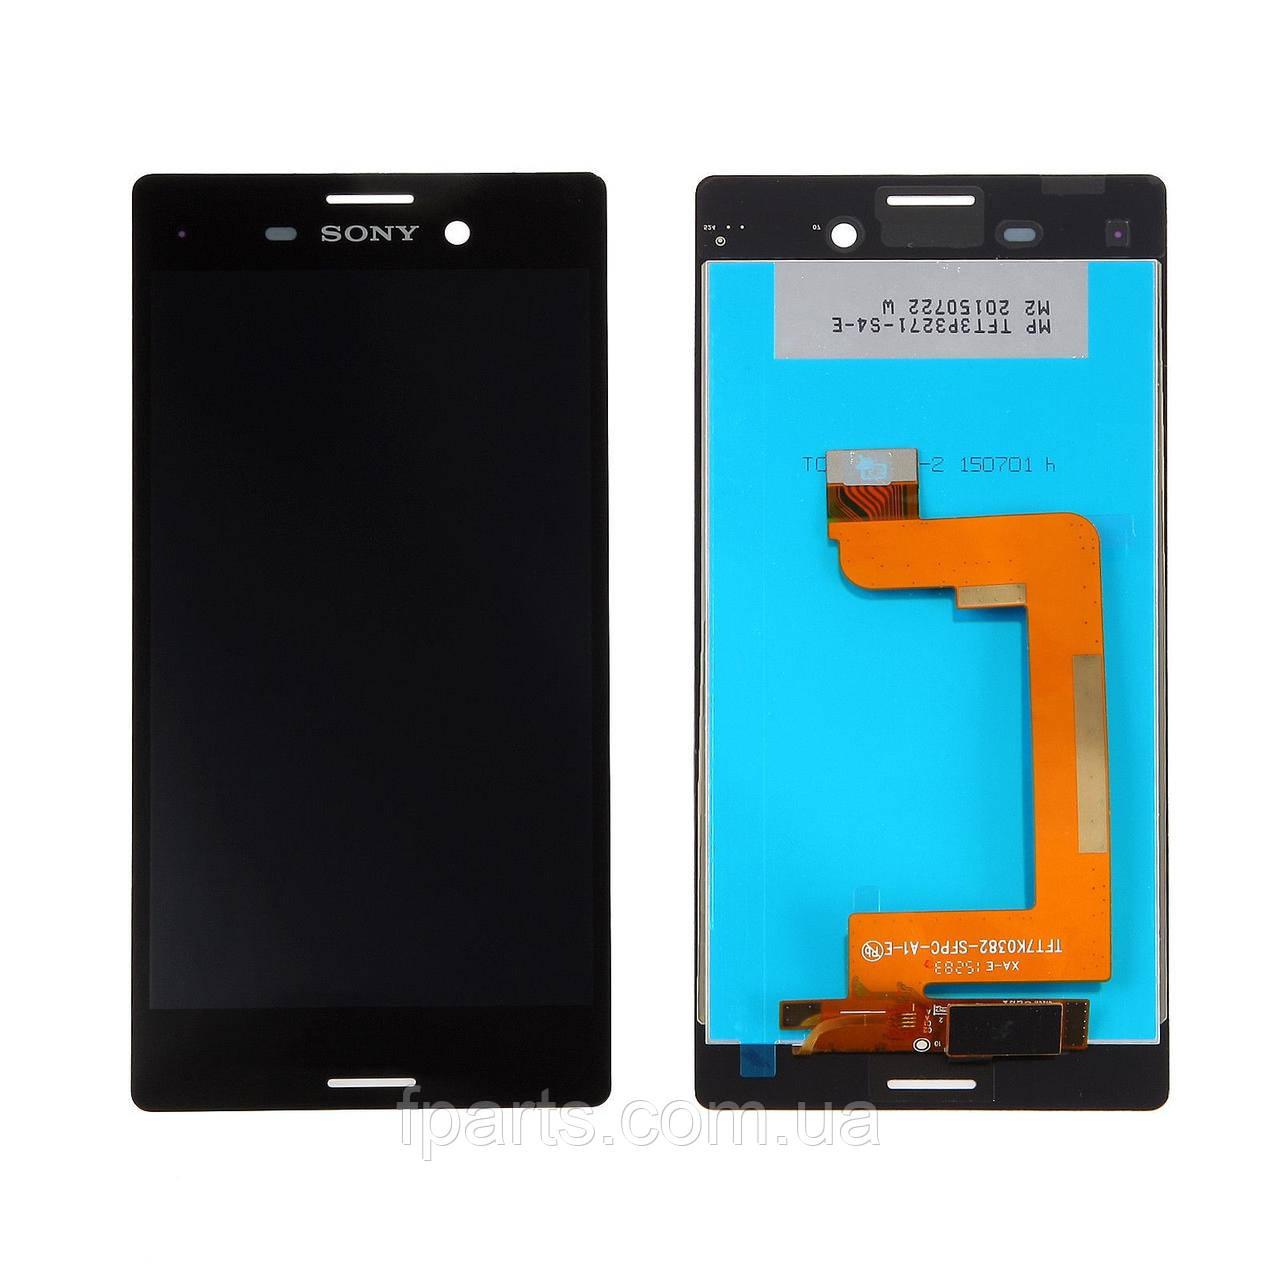 Дисплей для Sony Xperia M4 Aqua E2303, E2312 с тачскрином (Black)